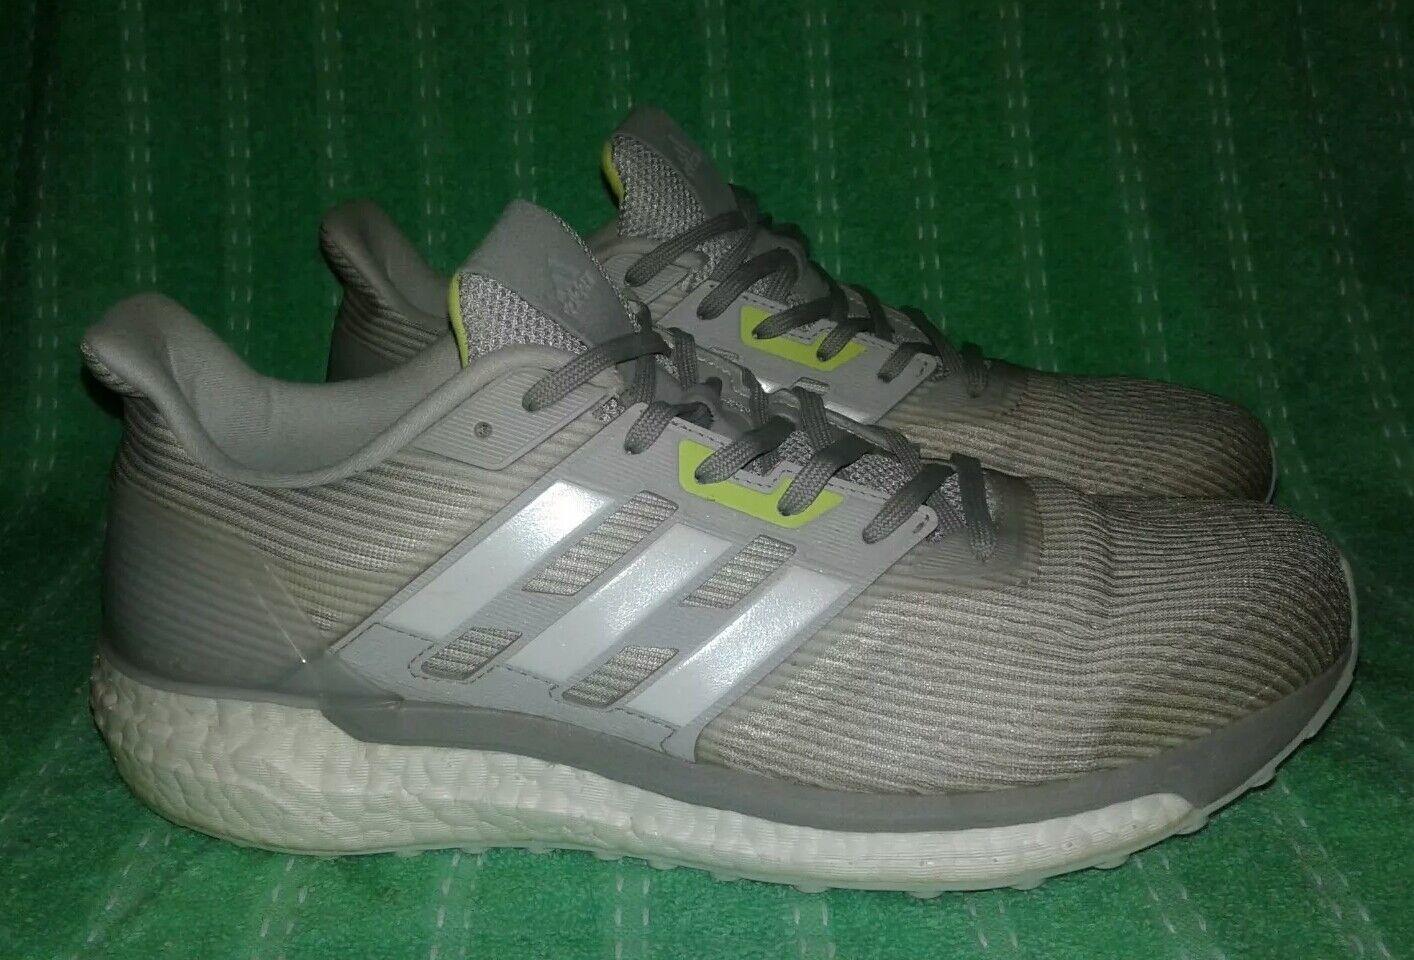 Womens Adidas Supernova BOOST  Running Training shoes Size 11 B